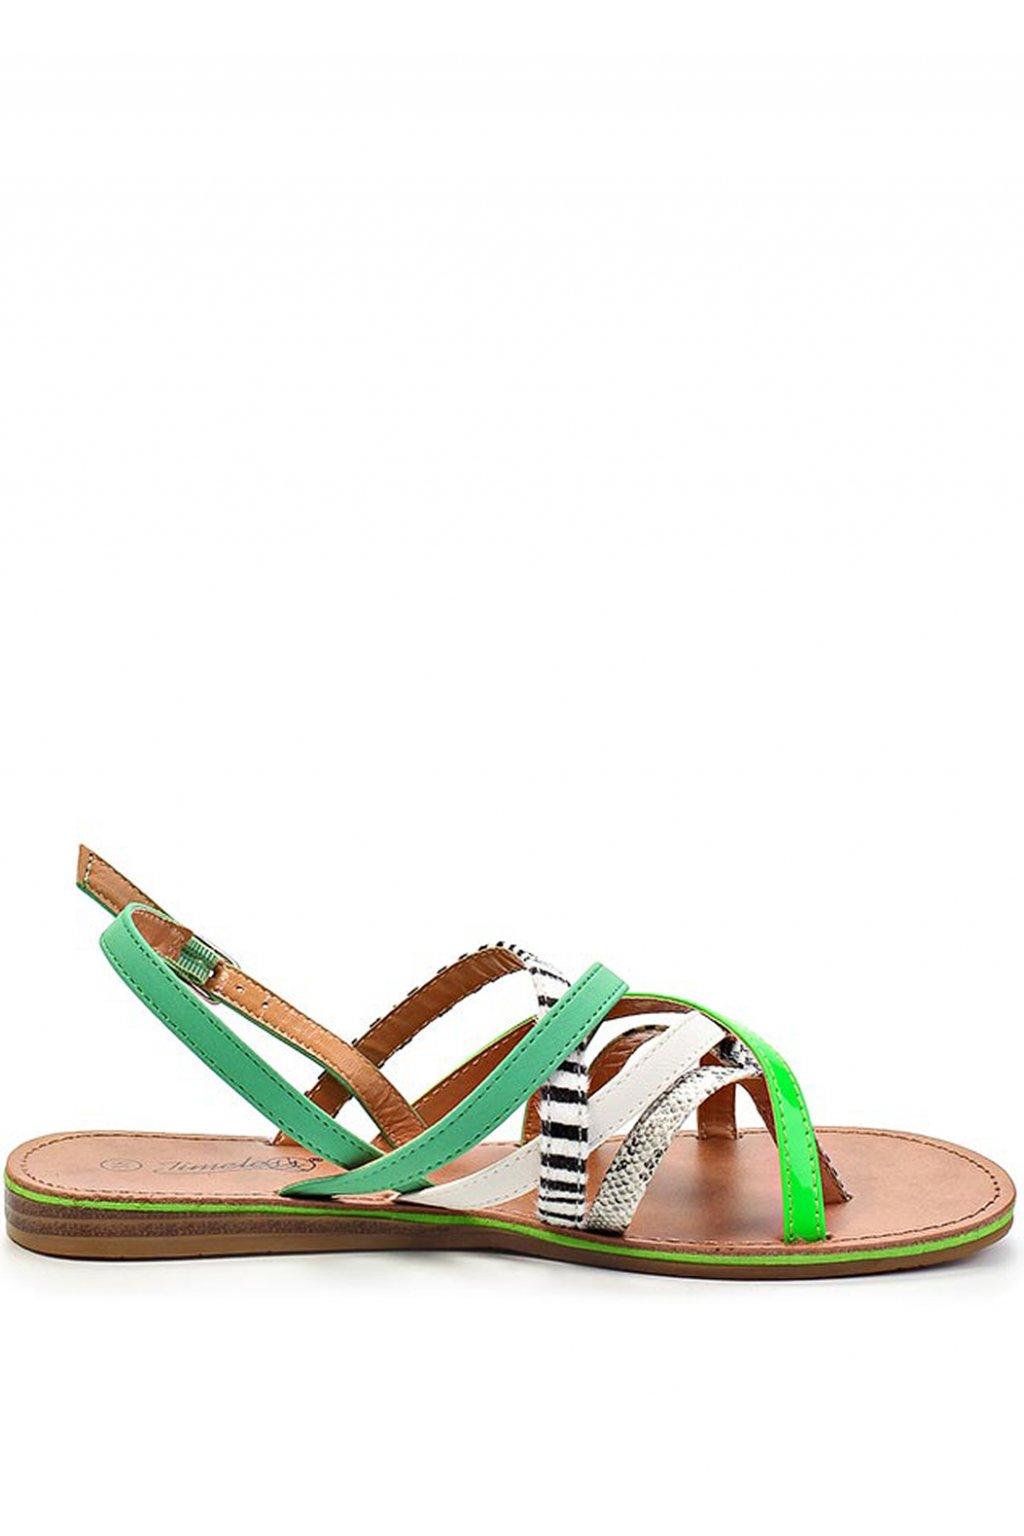 Barevné páskové zebra-snake sandály Timeless